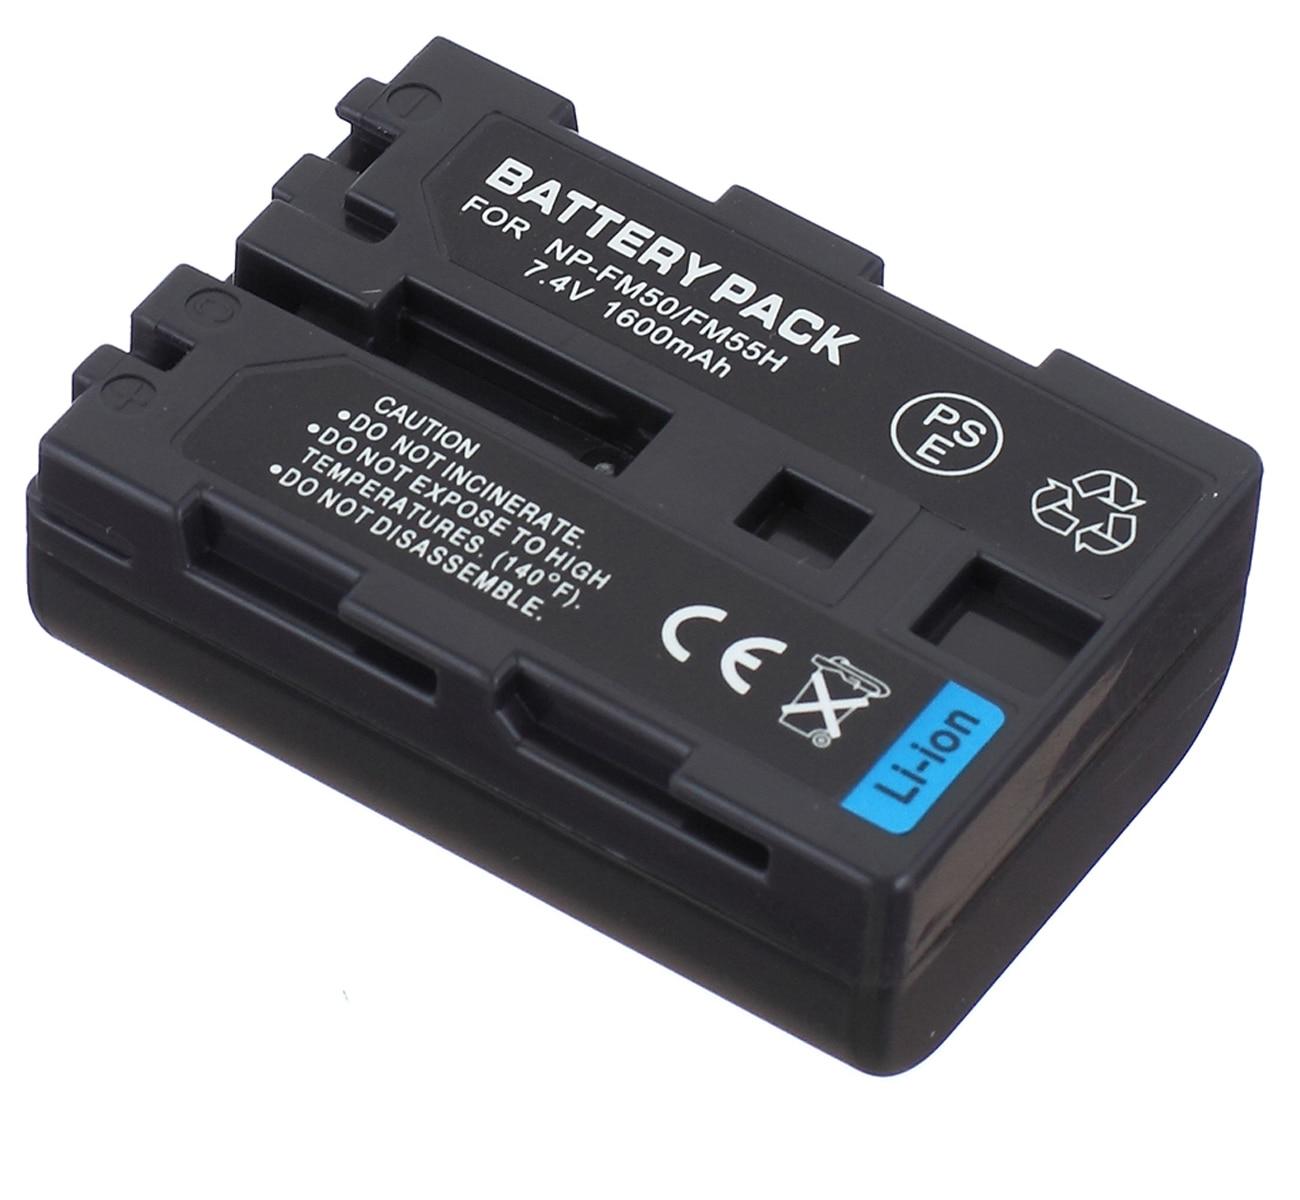 3x BATTERY INTENSILO 3200mAh FOR SONY DCR-PC6 PC6E PC8 PC9 PC9E PC100 E